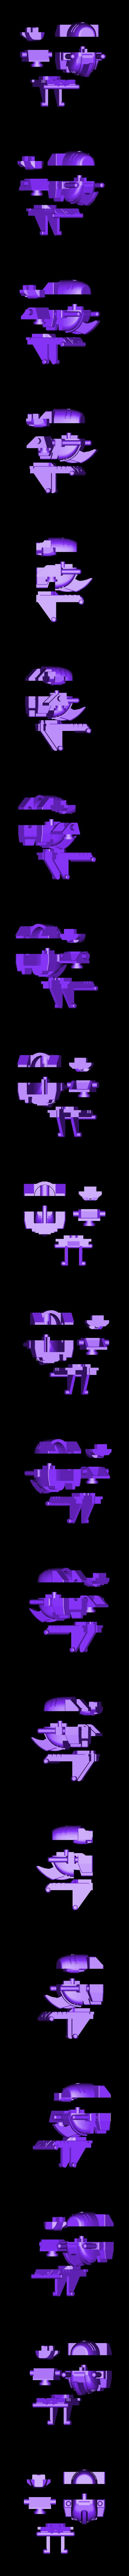 1_Head.stl Download STL file Jinbao Not Bruticus Upgrade Kit G1 Ver • 3D print template, Toymakr3D